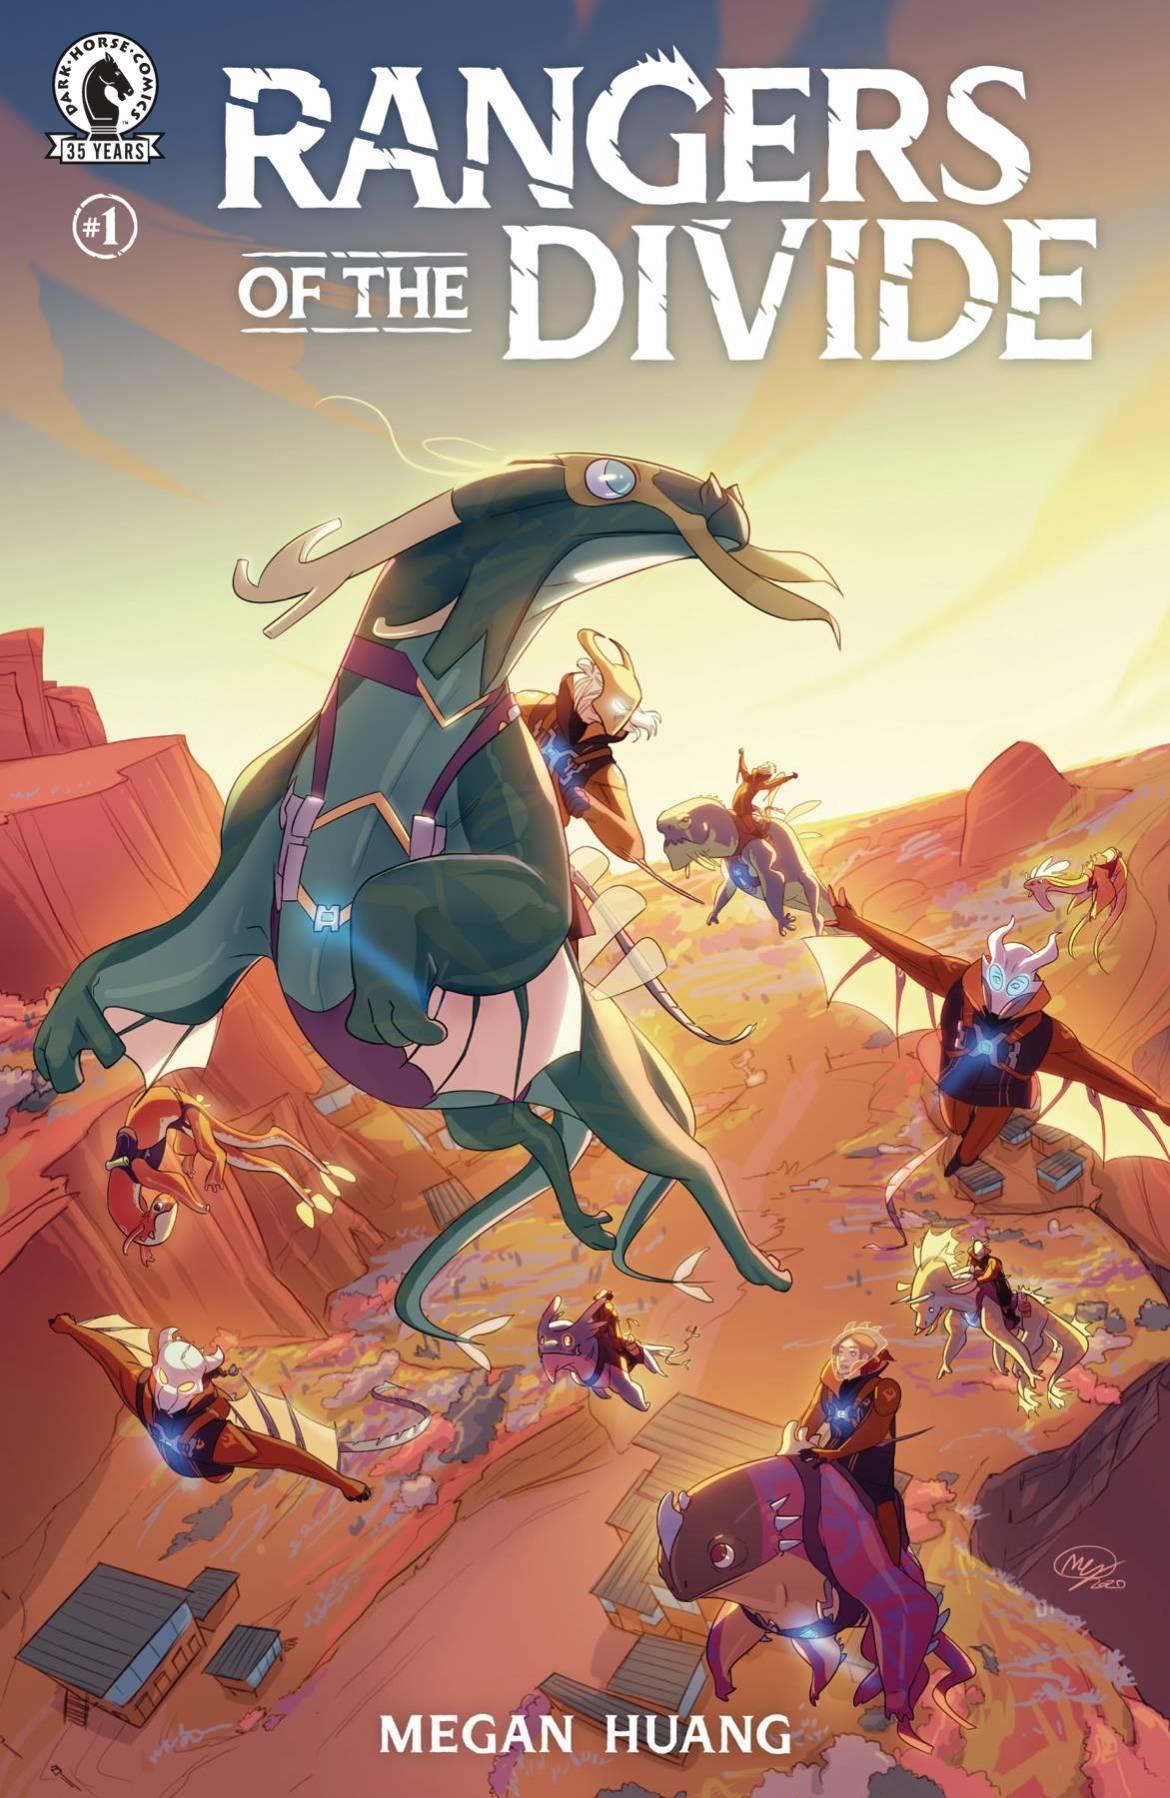 STL185740 ComicList: Dark Horse Comics New Releases for 05/19/2021